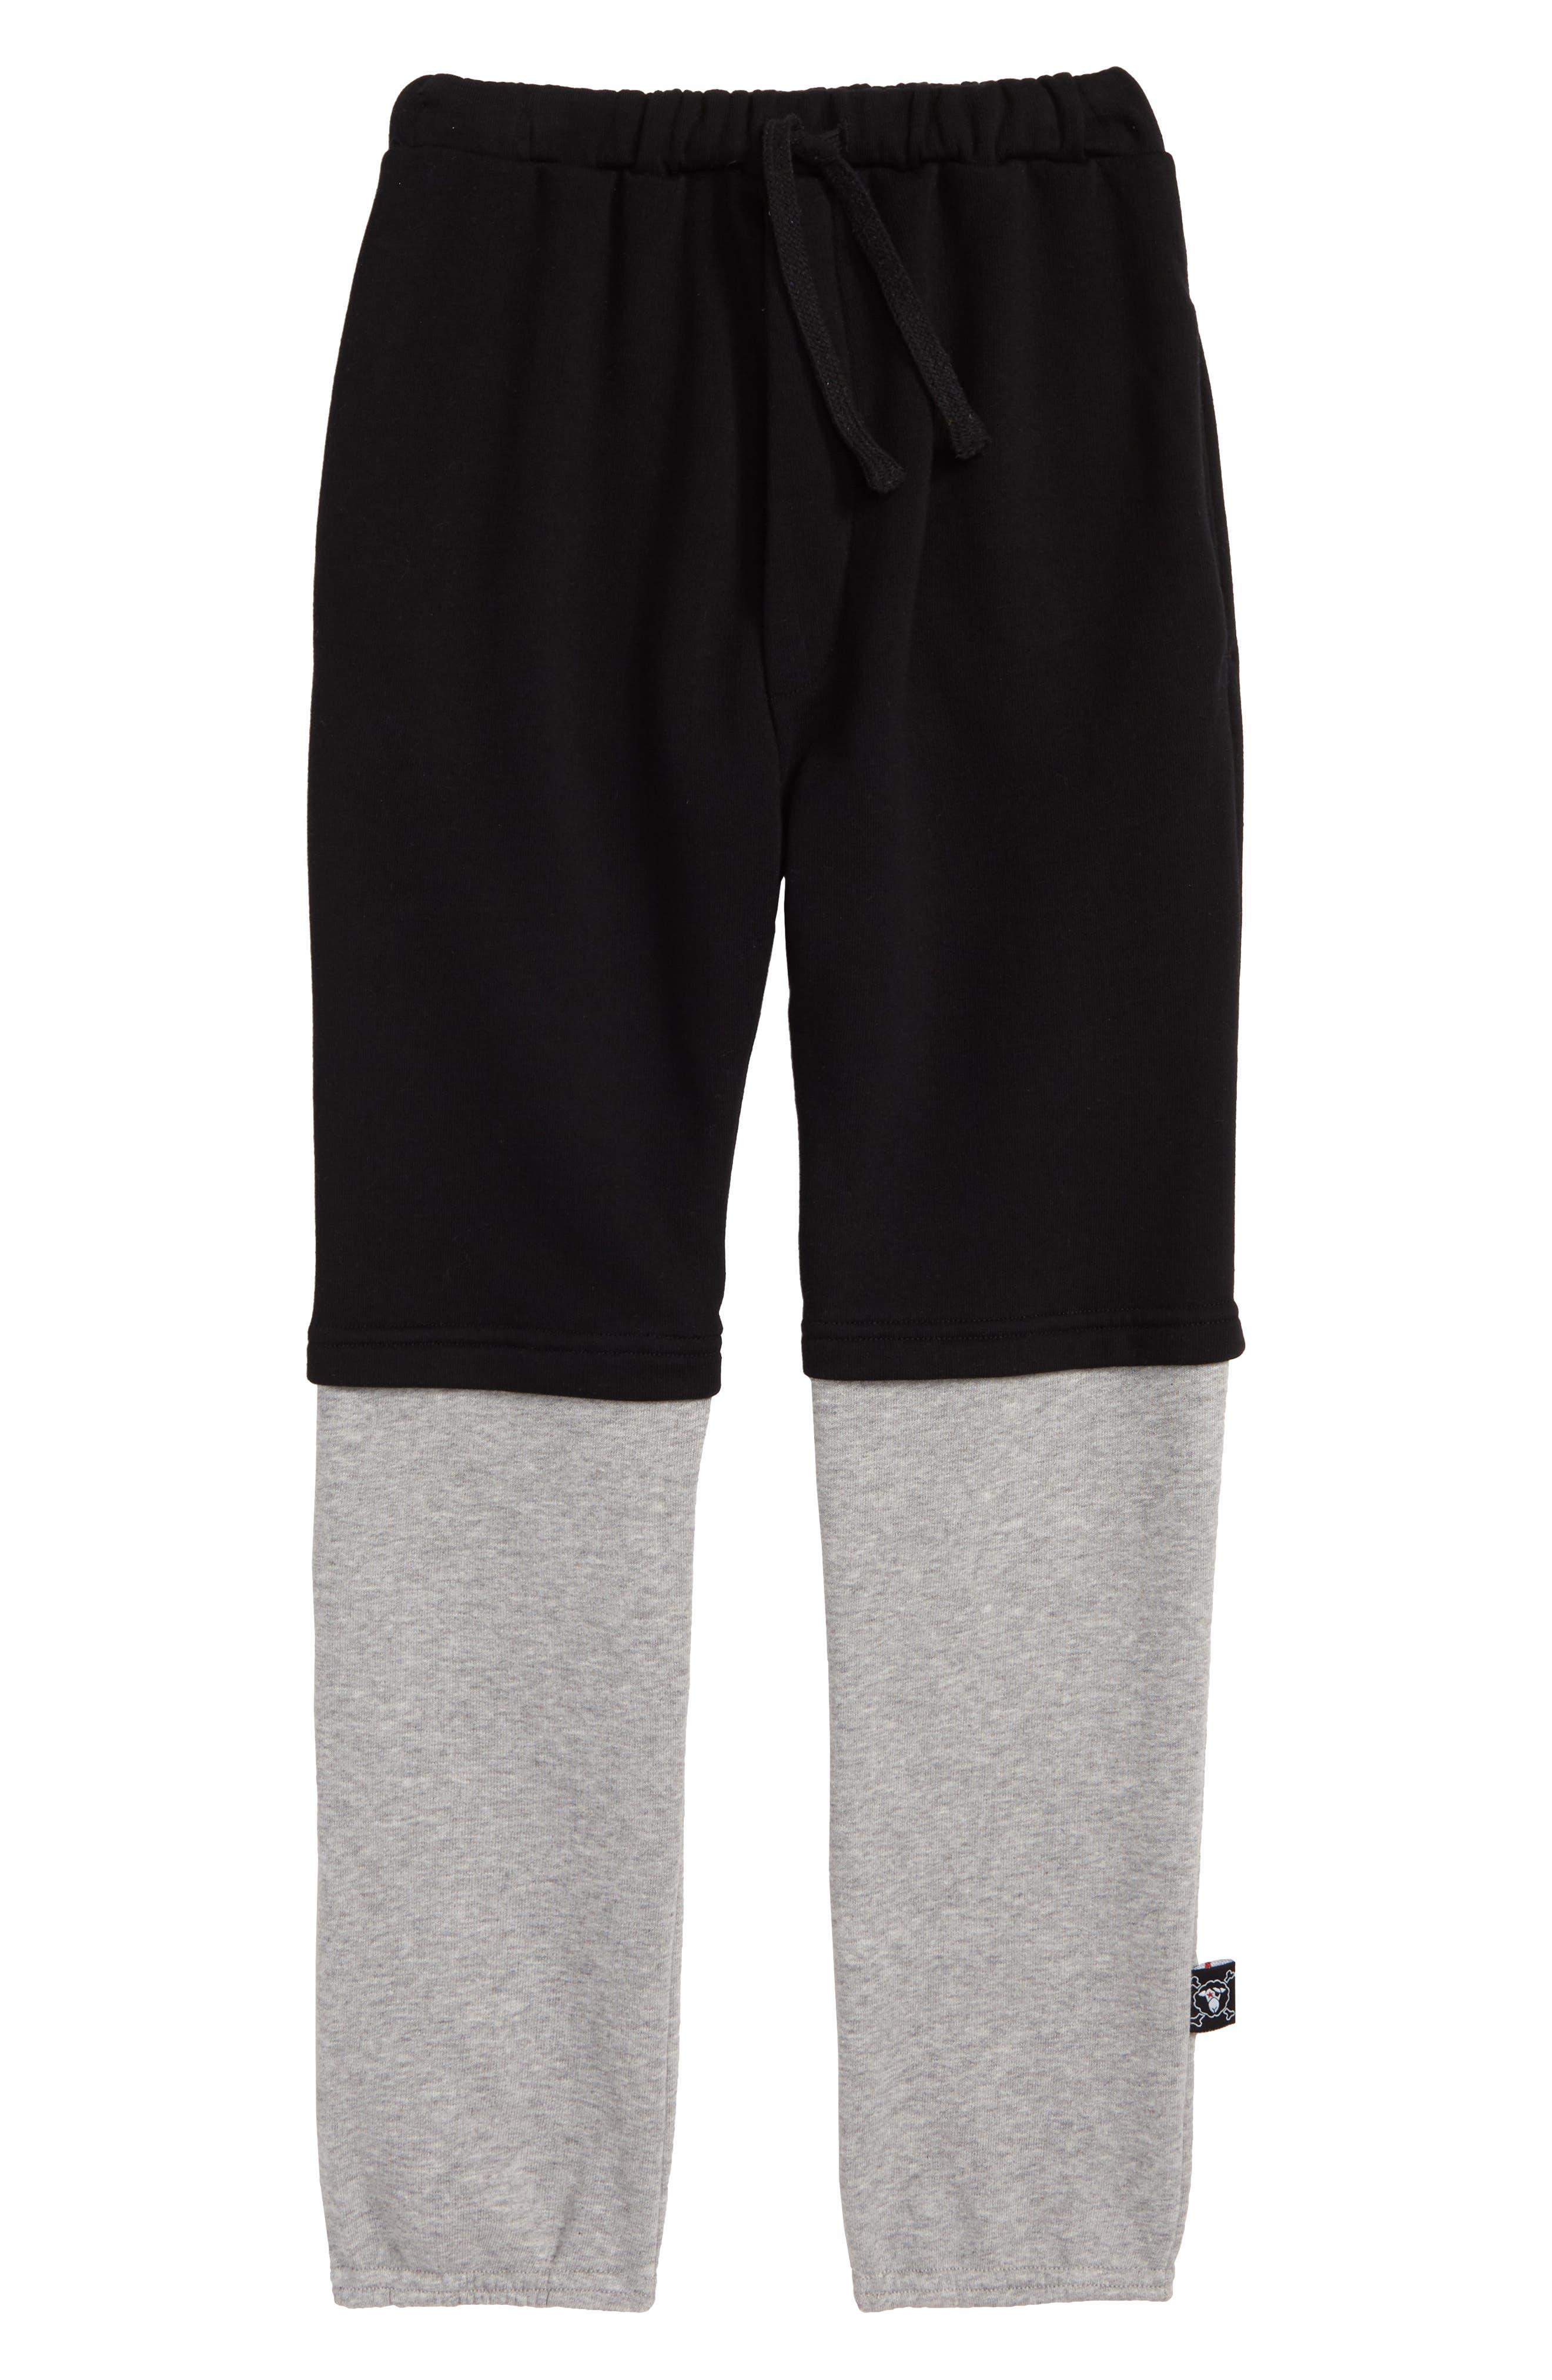 Double Sweatpants,                             Main thumbnail 1, color,                             Black/ Heather Grey